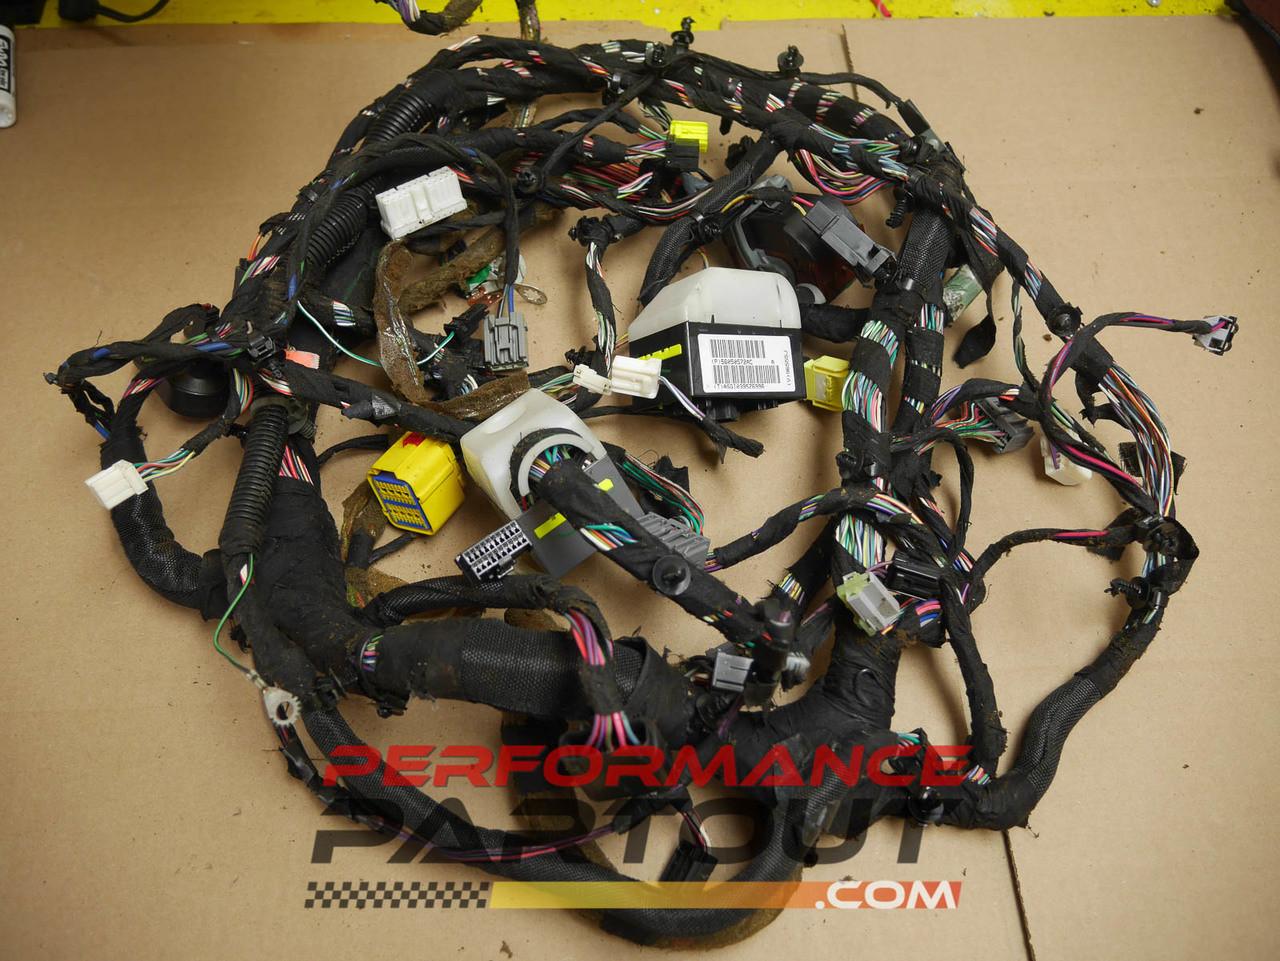 hight resolution of under dash wiring harness jeep grand cherokee 56050572acunder dash wiring harness jeep grand cherokee 56050572ac performance